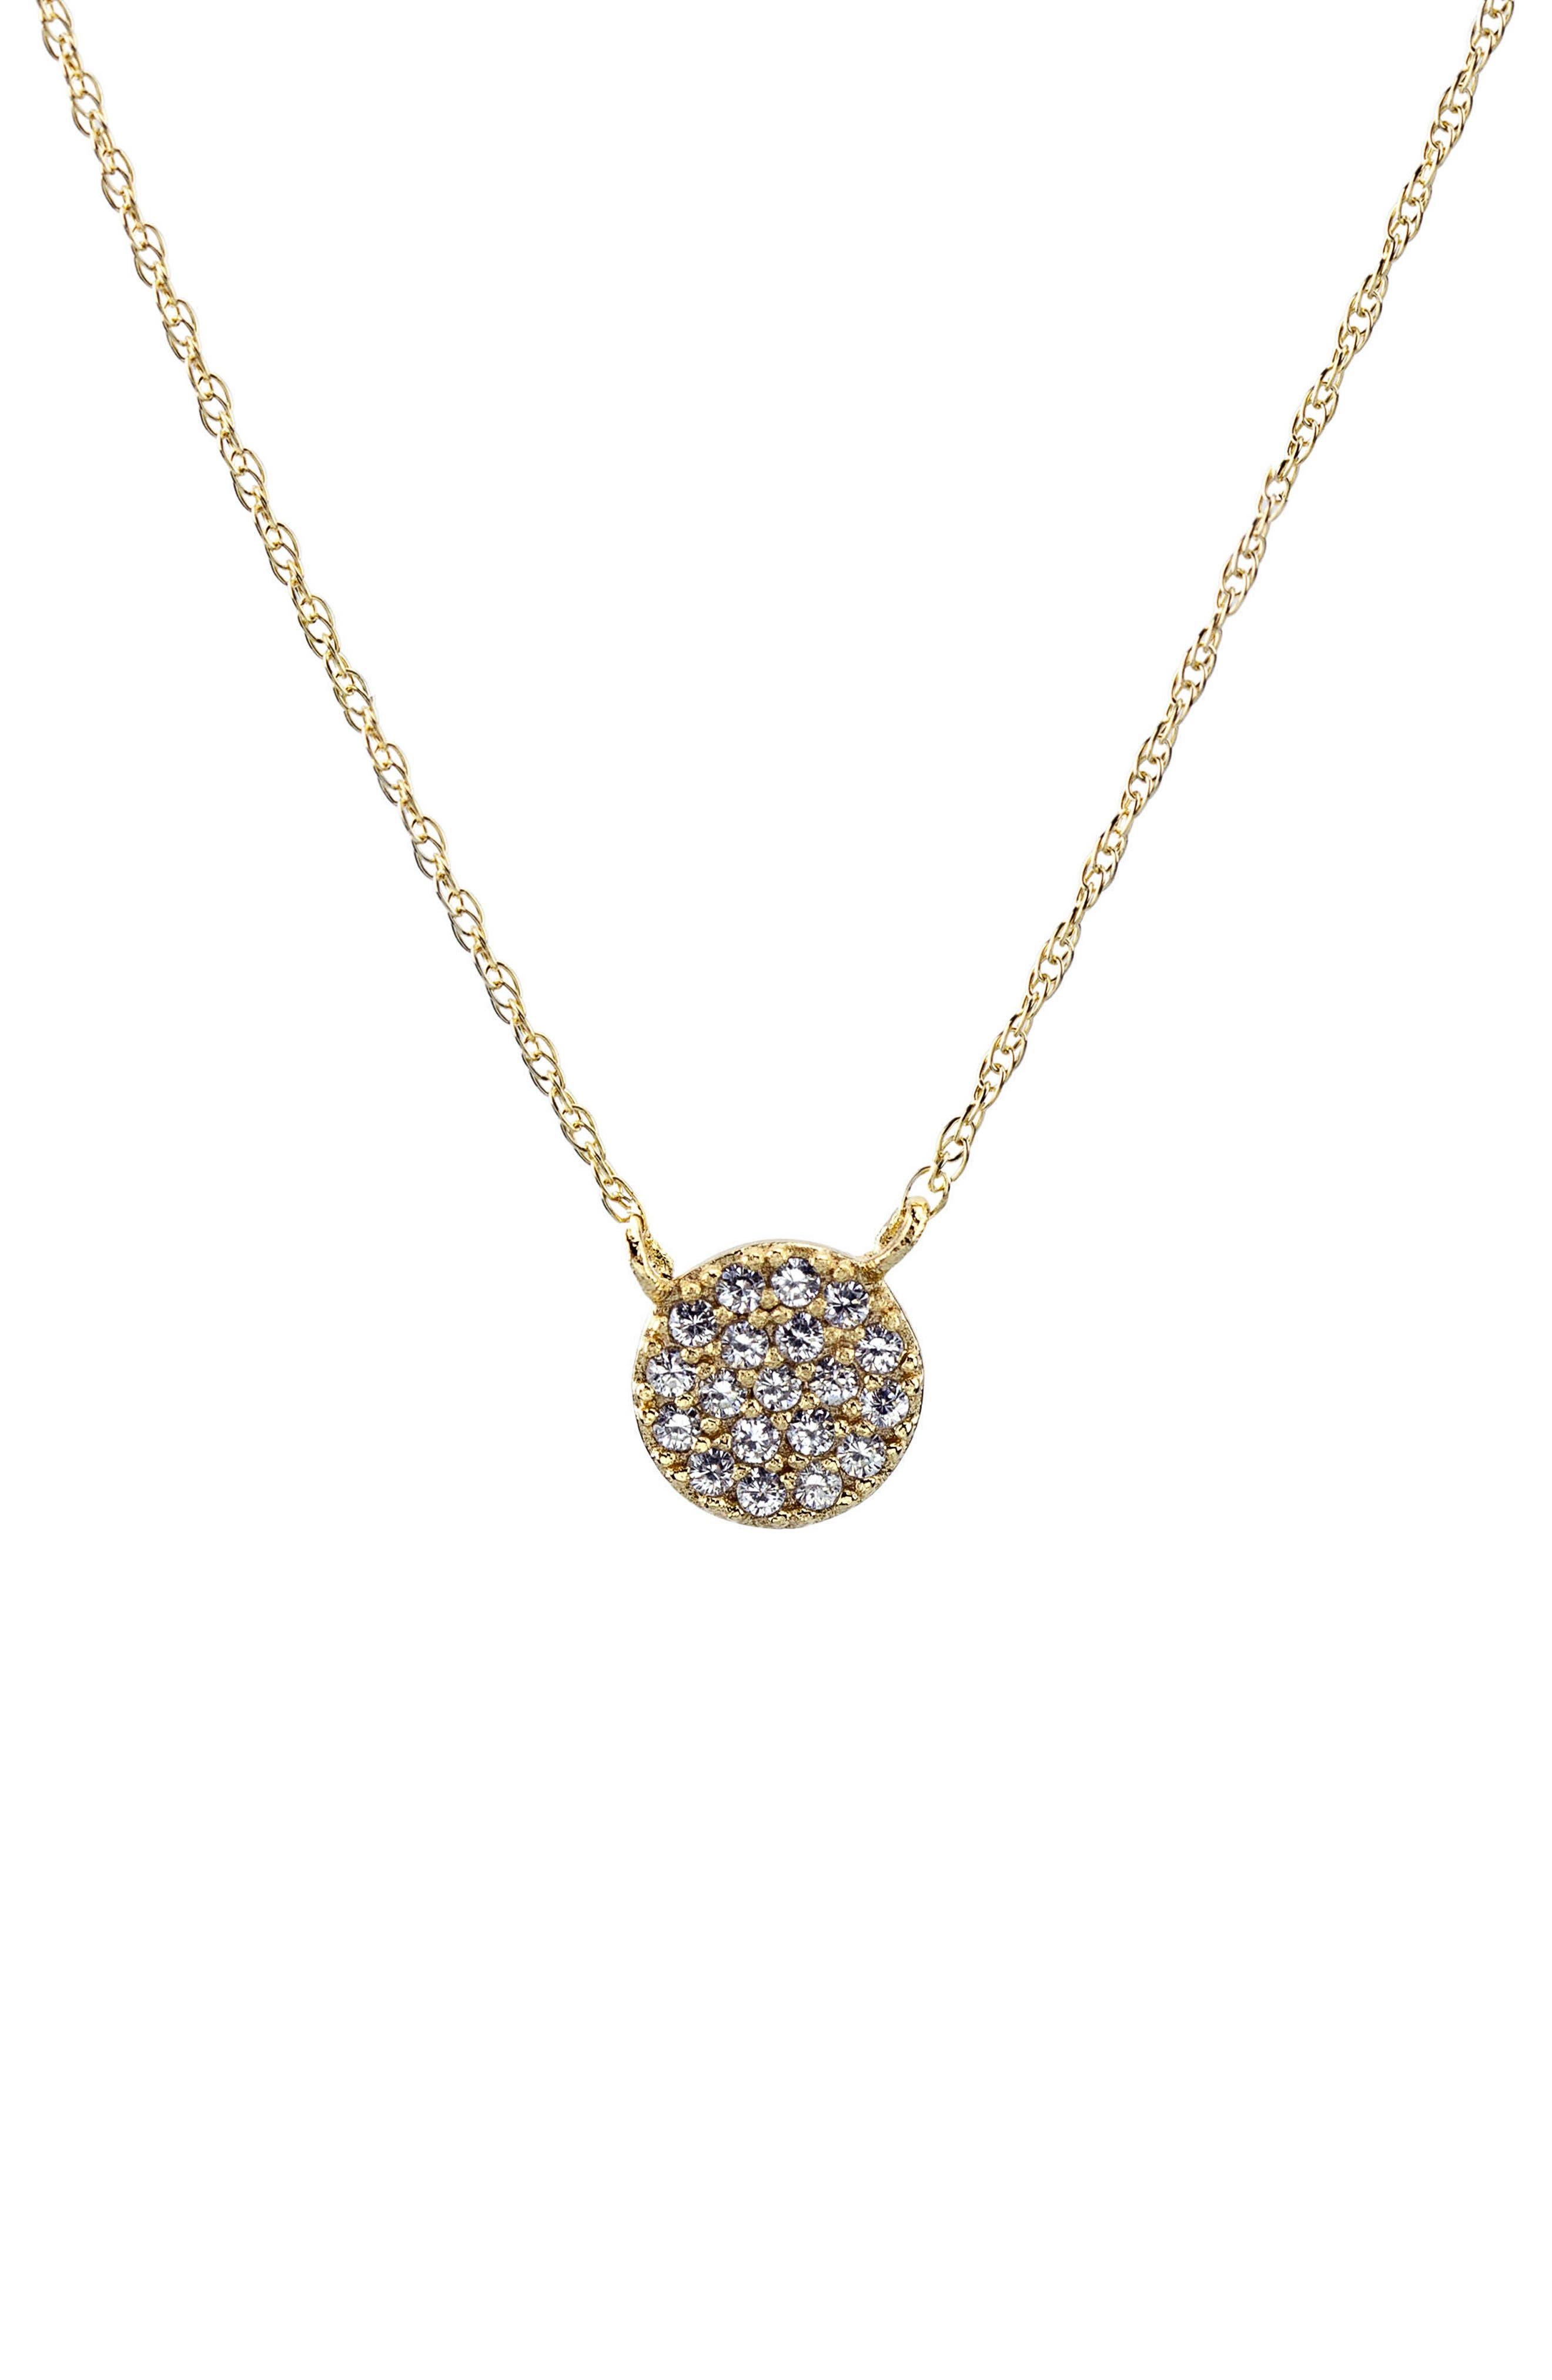 Pavé Round Charm Necklace,                             Main thumbnail 1, color,                             Gold